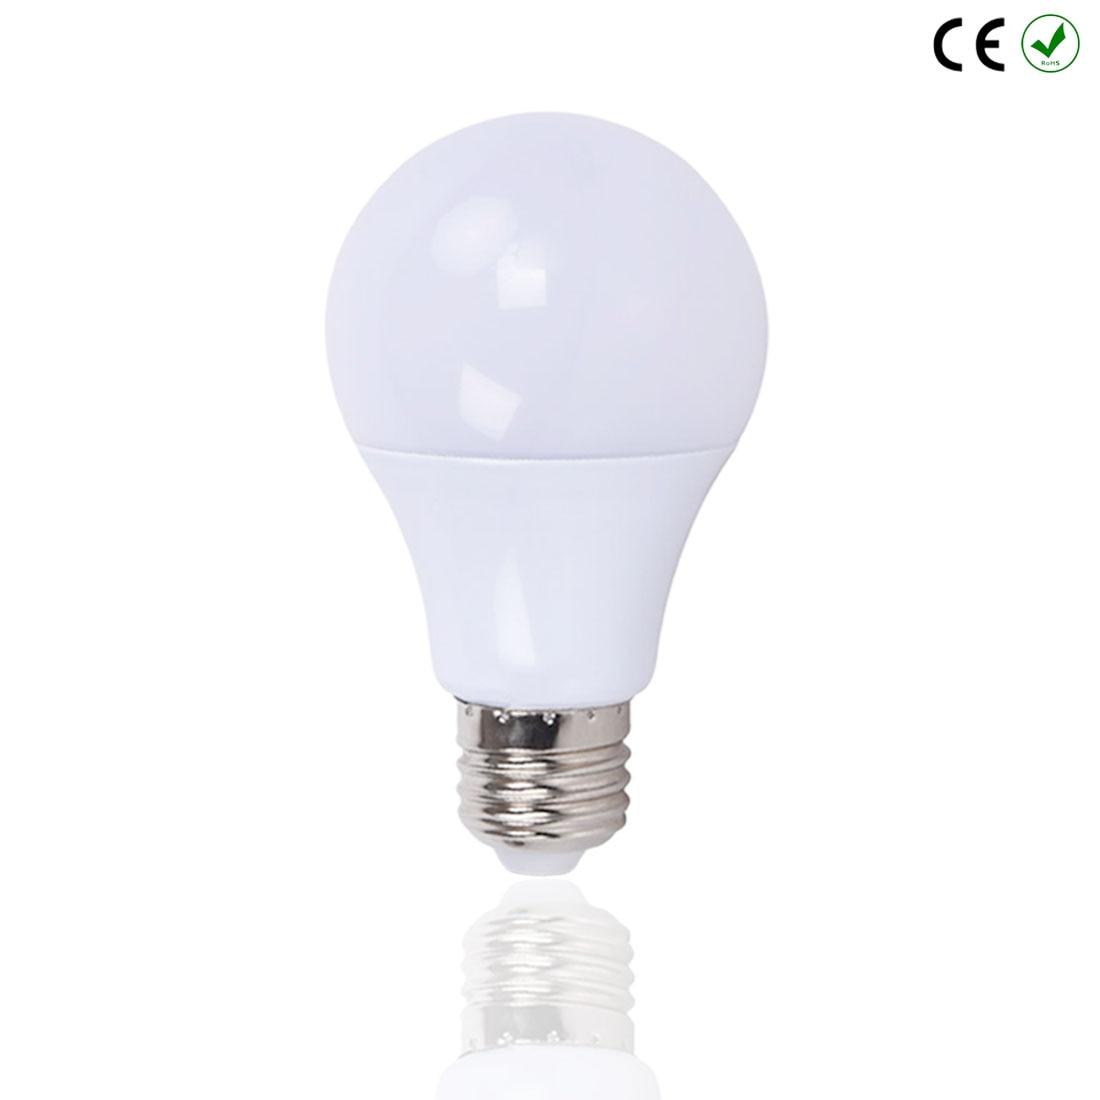 Free Shipping Lampada LED Bombillas LED Bulb Lamps 85-220V Light Real Power 3W 5W 7W 9W 12W High Brightness SMD2835 E27